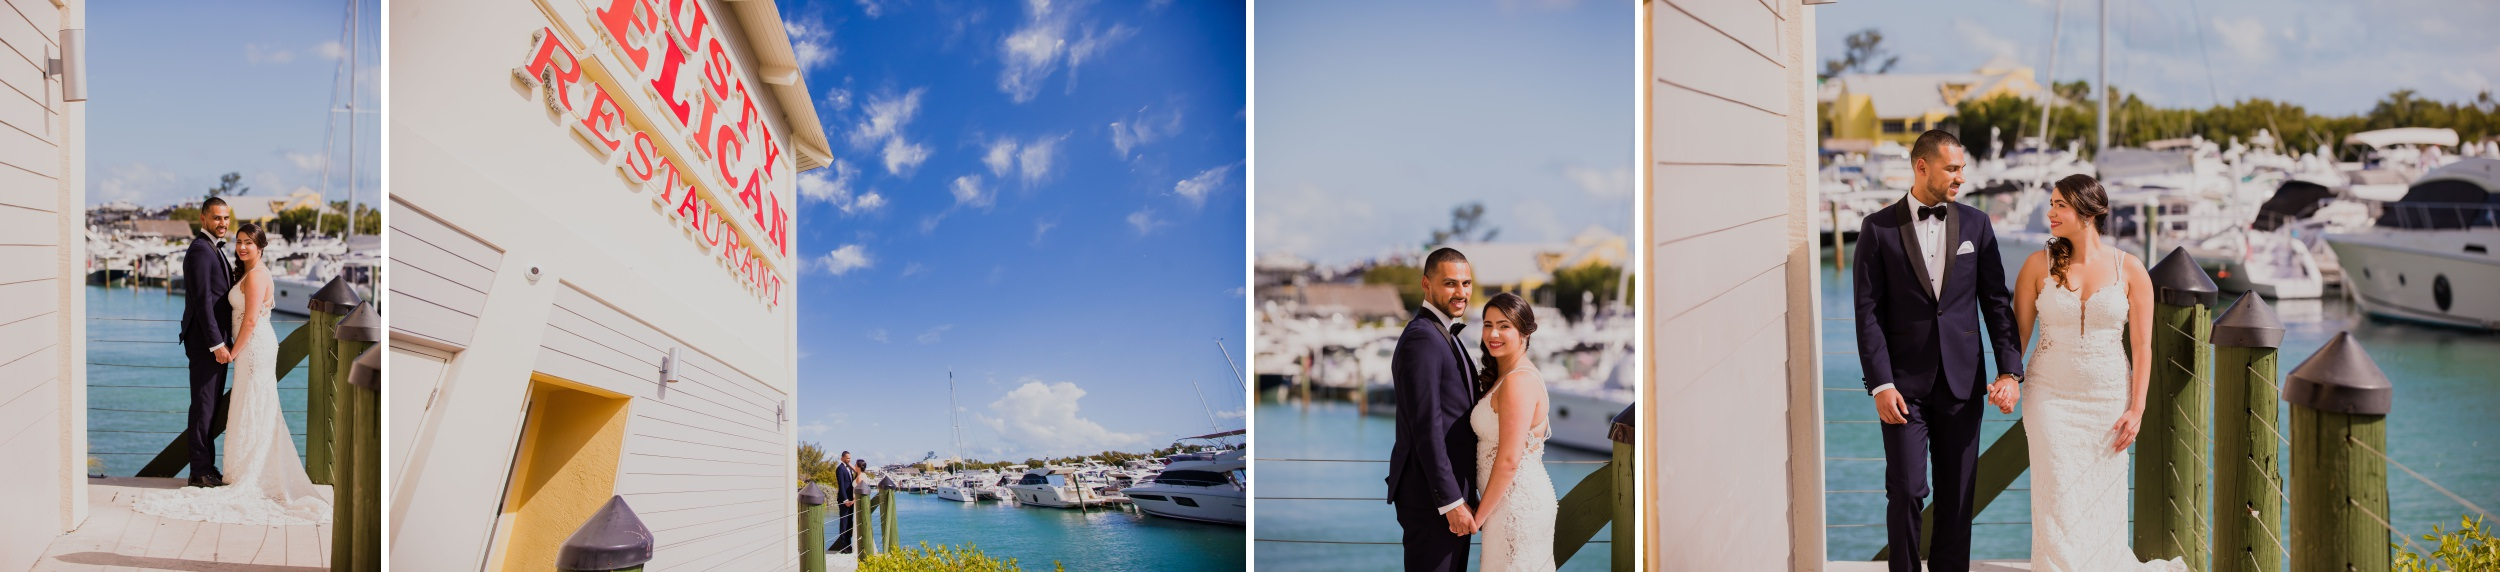 Wedding - Rusty Pelican - Key Biscayne - Santy Martinez Photography 21.jpg